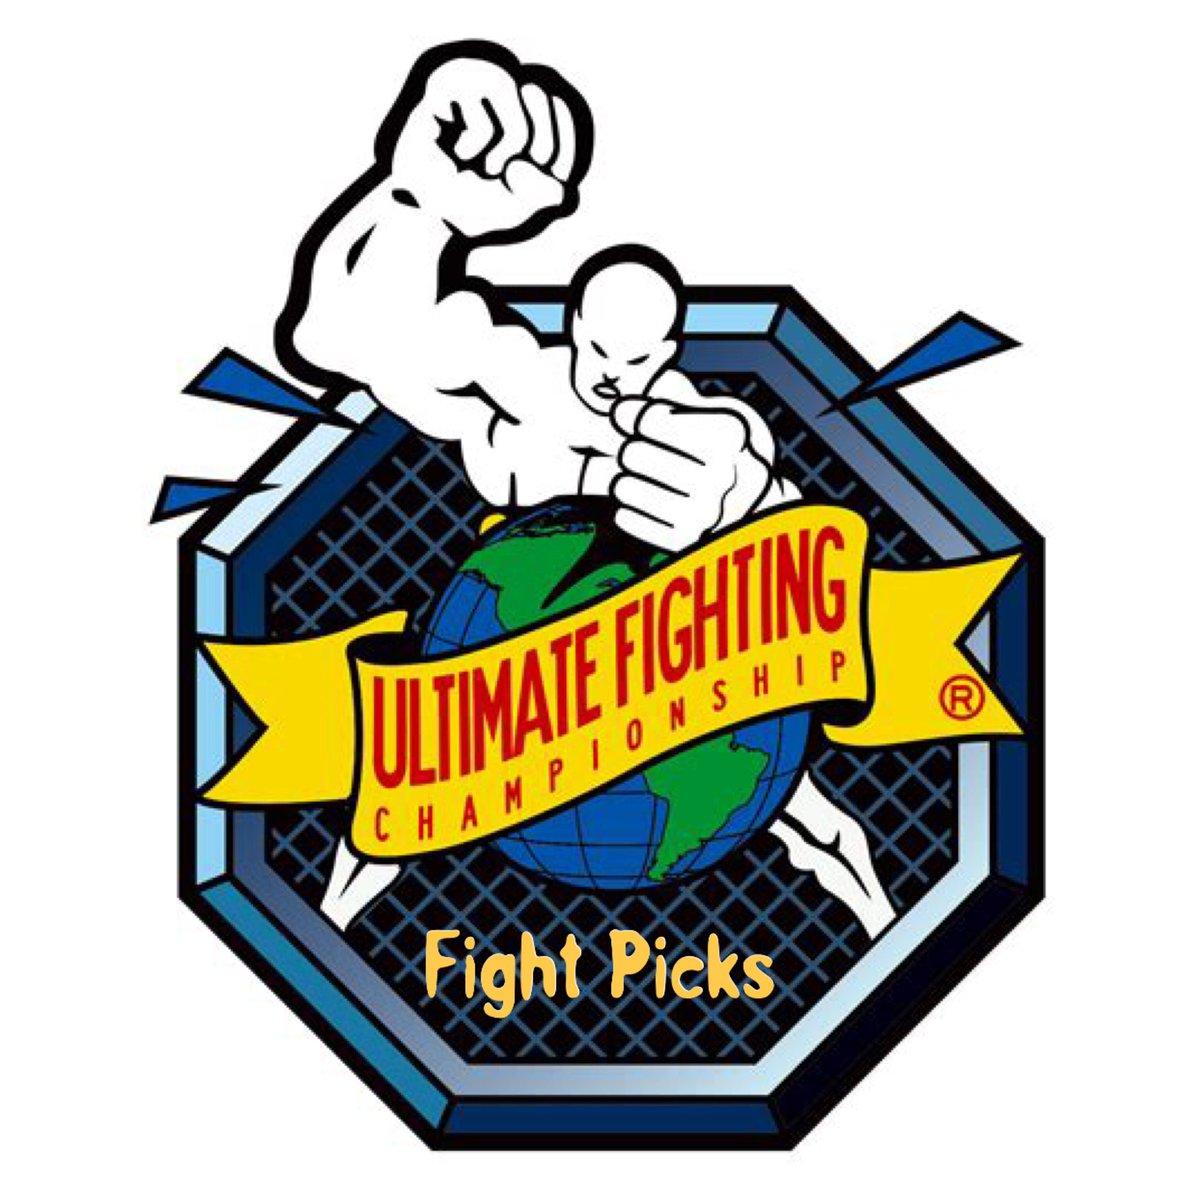 💰2020 #FightPick record:   • Overall: (101-69) | 59.41%  - Main Card: (43-36) | 54.43% - Prelims: (53-27) | 66.25% - Early Prelims: (5-6) | 45.45%   1️⃣ Draw: #UFCBrasilia  1️⃣ No Contest: #UFC247 https://t.co/xRMznS0rqF